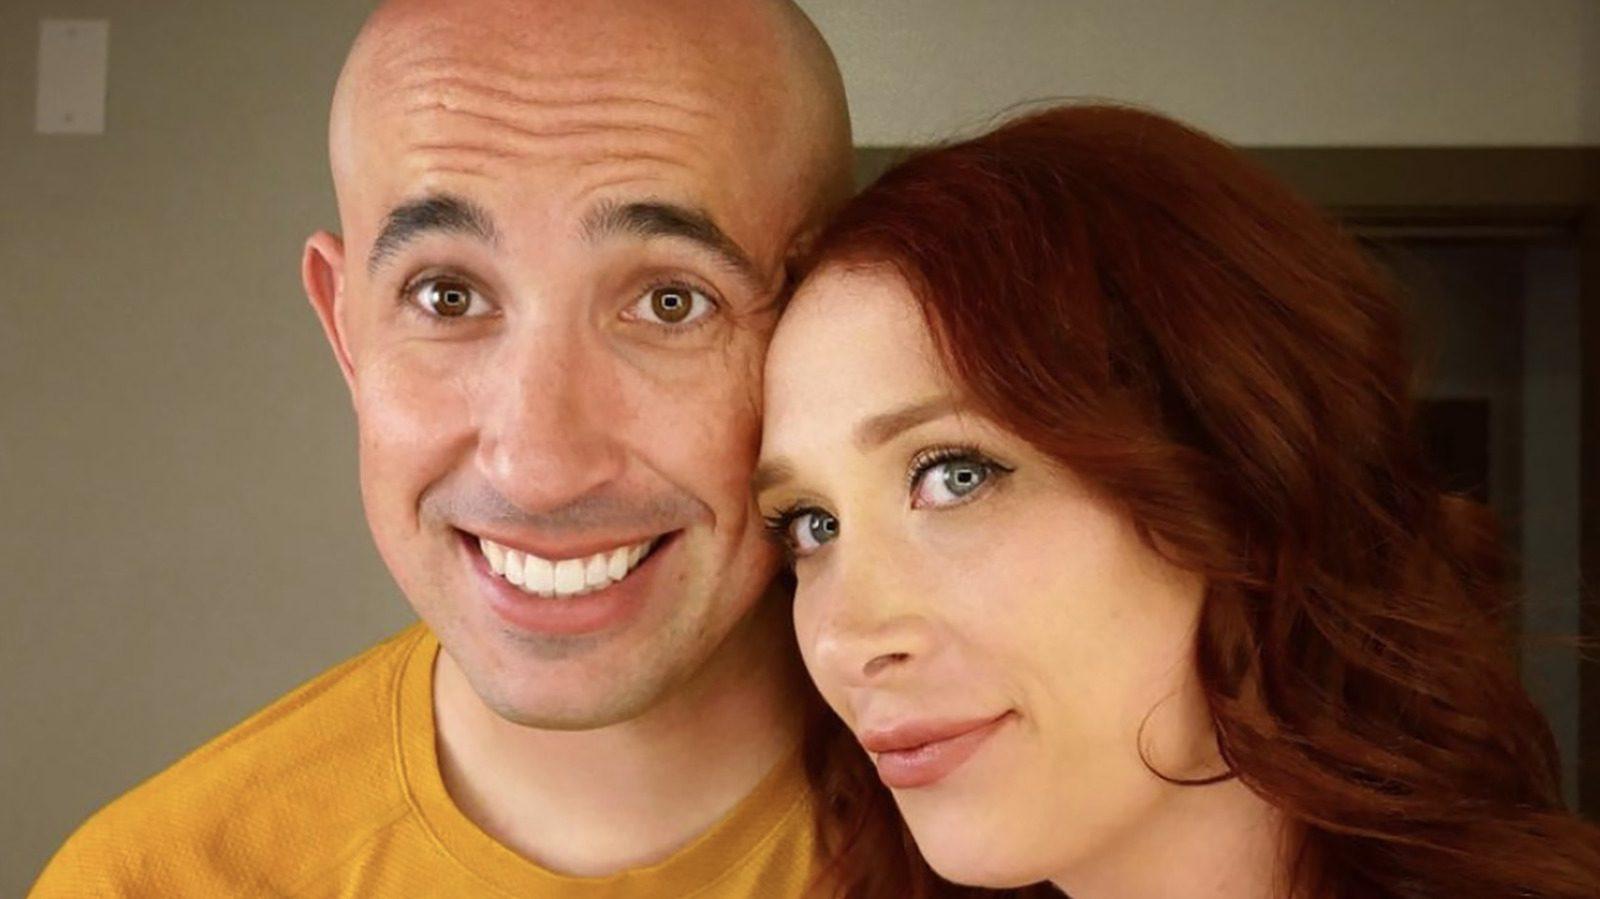 Jamie Thompson and Elizabeth Bice